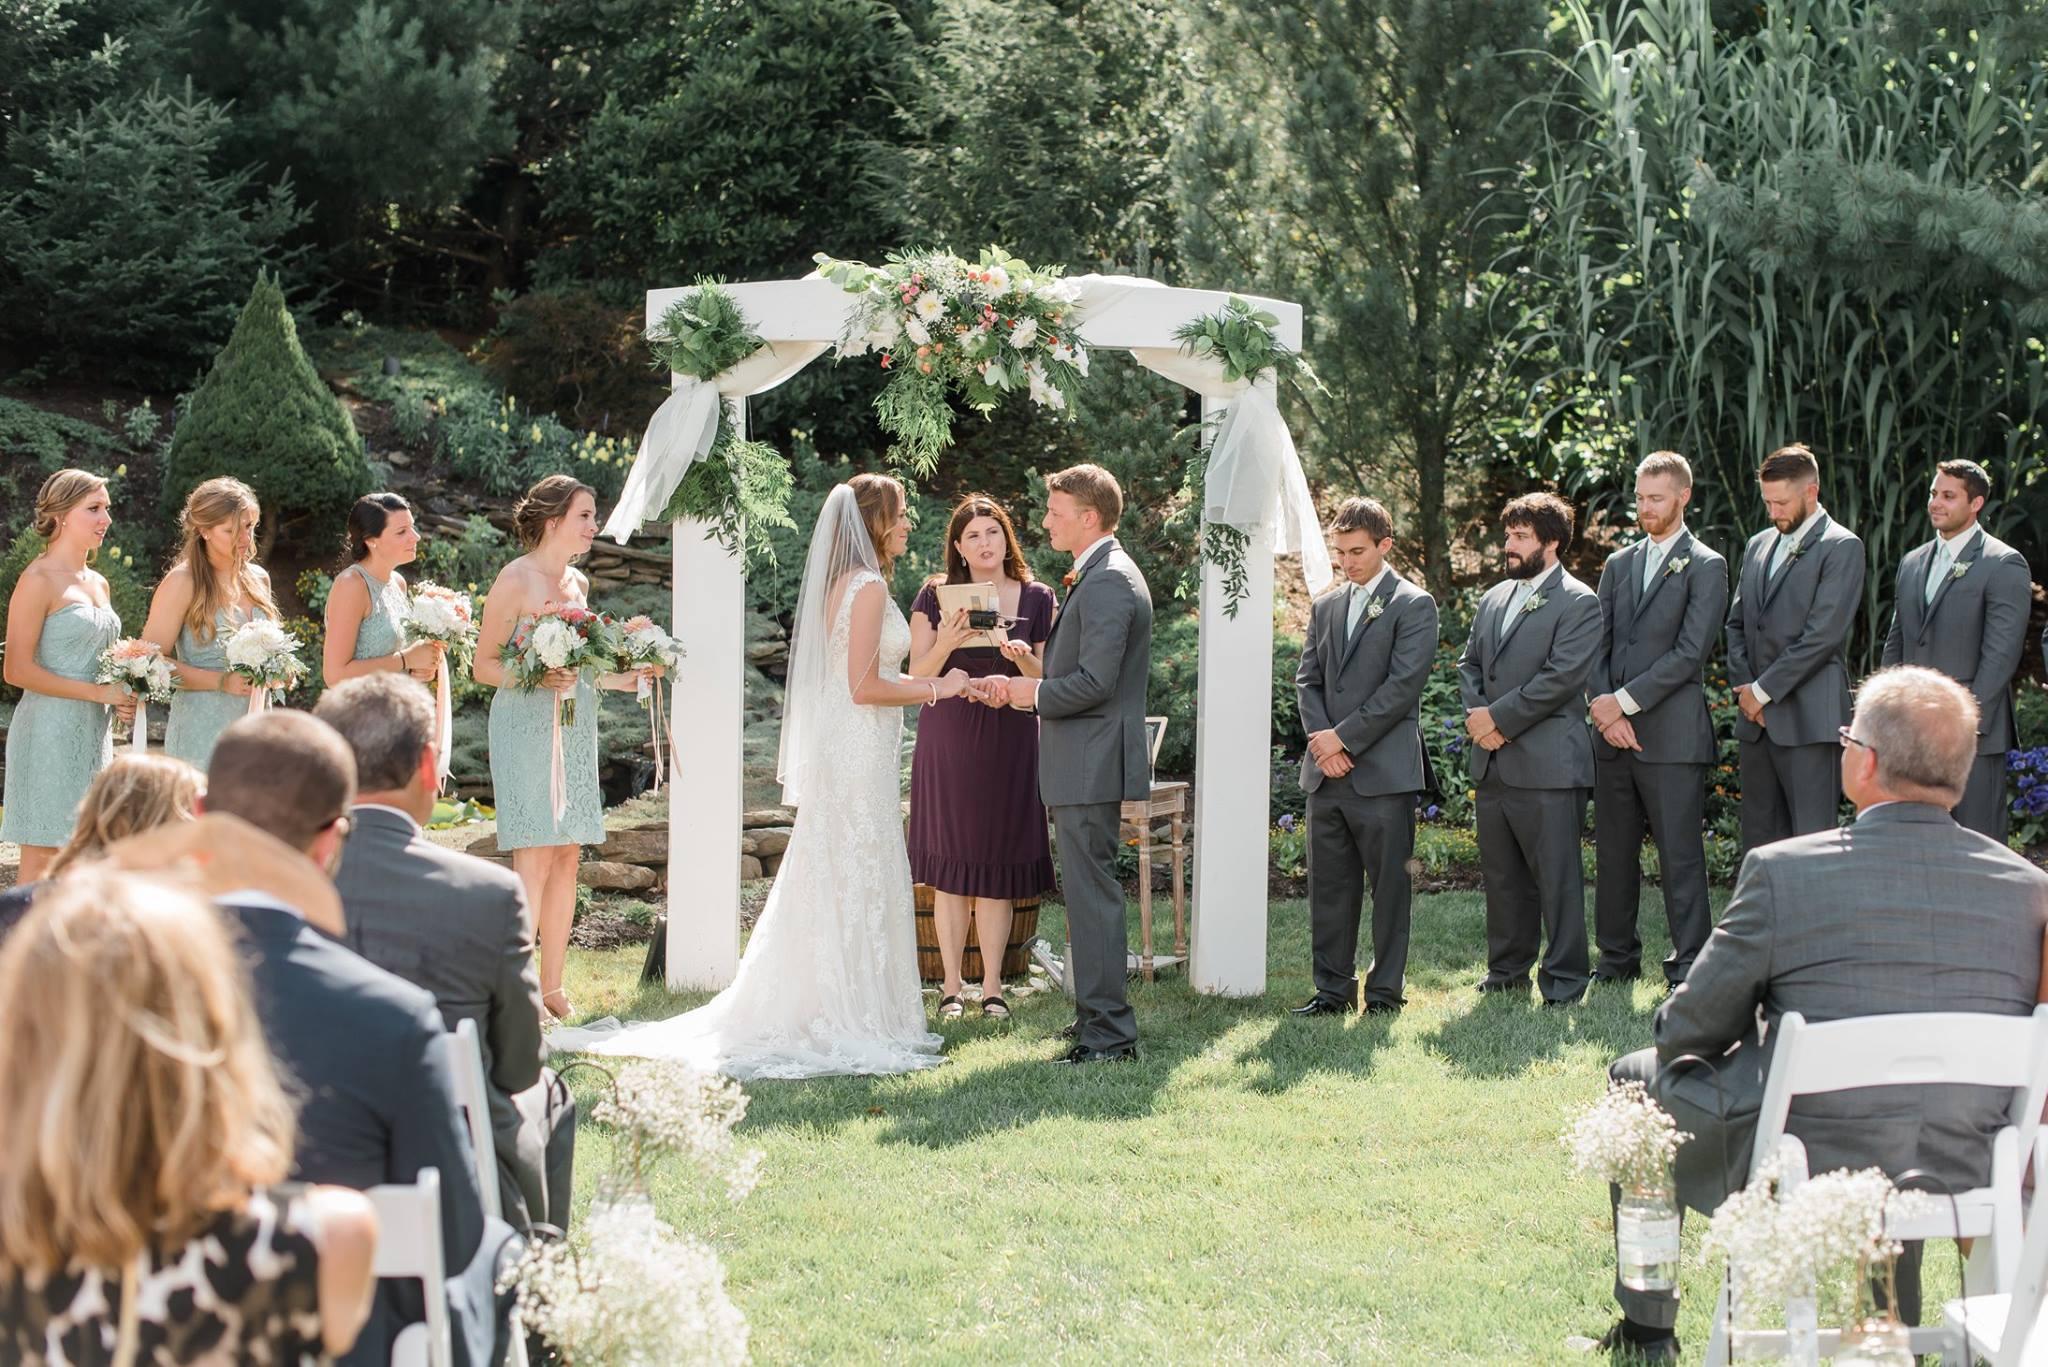 gardens-at-stonebridge-wedding-pittsburgh-classic-outdoor-pennsylvania-0017.jpg